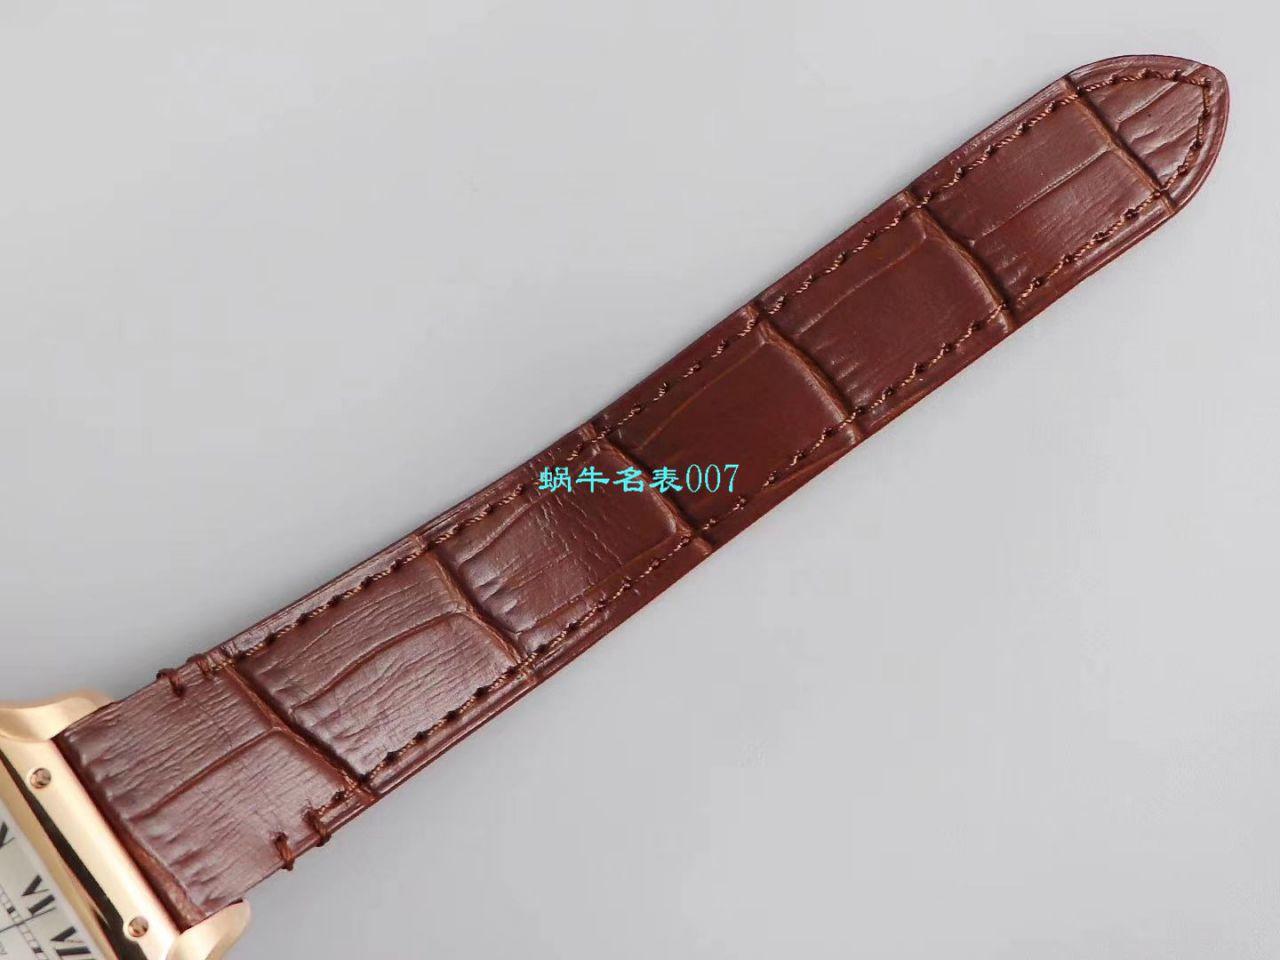 【V6厂超A高仿手表】卡地亚山度士系列WGSA0012(中号)腕表 / K261